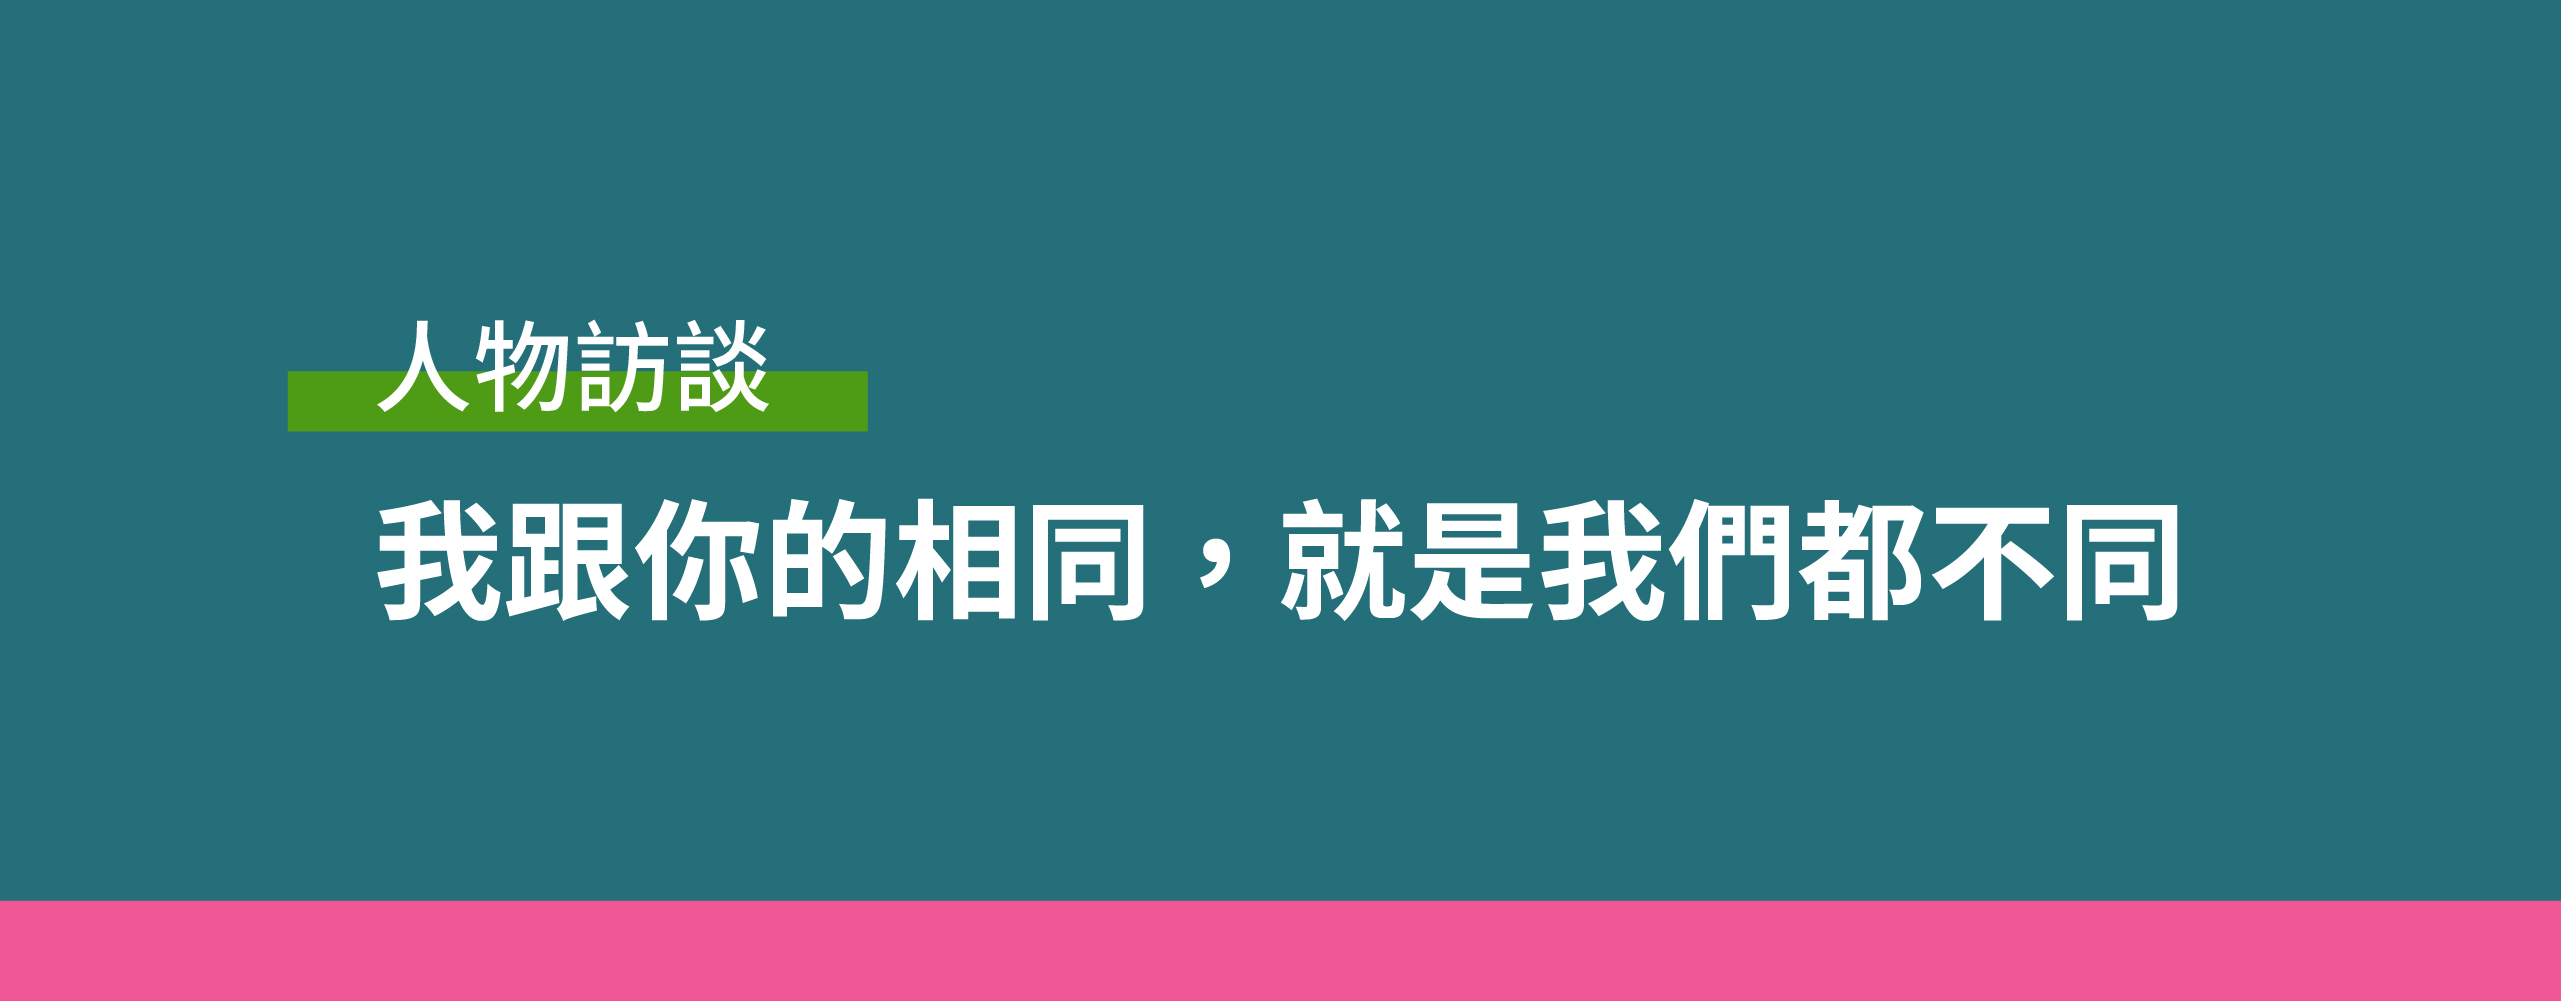 TAIWANfest Letterhead - Artist Talk